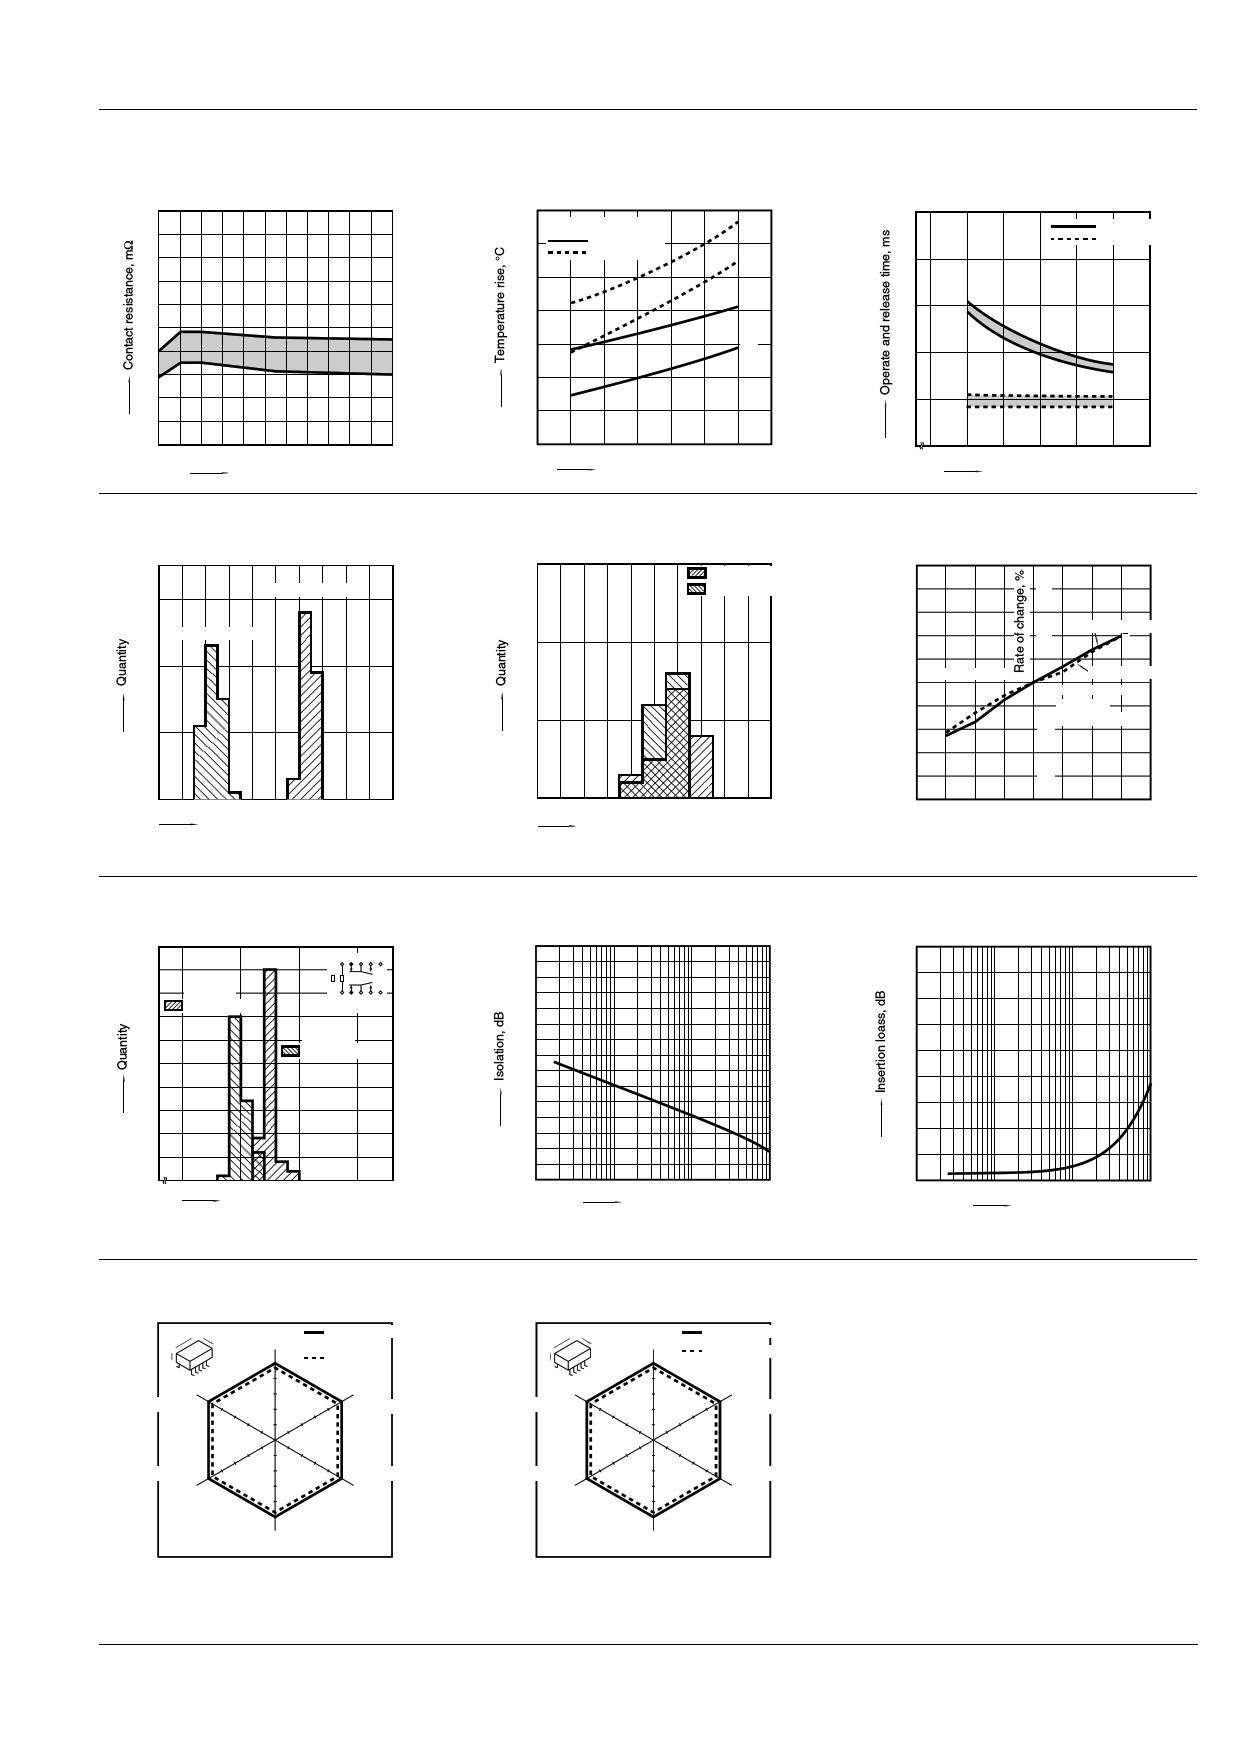 TQ2SL-L2-5V pdf, 반도체, 판매, 대치품